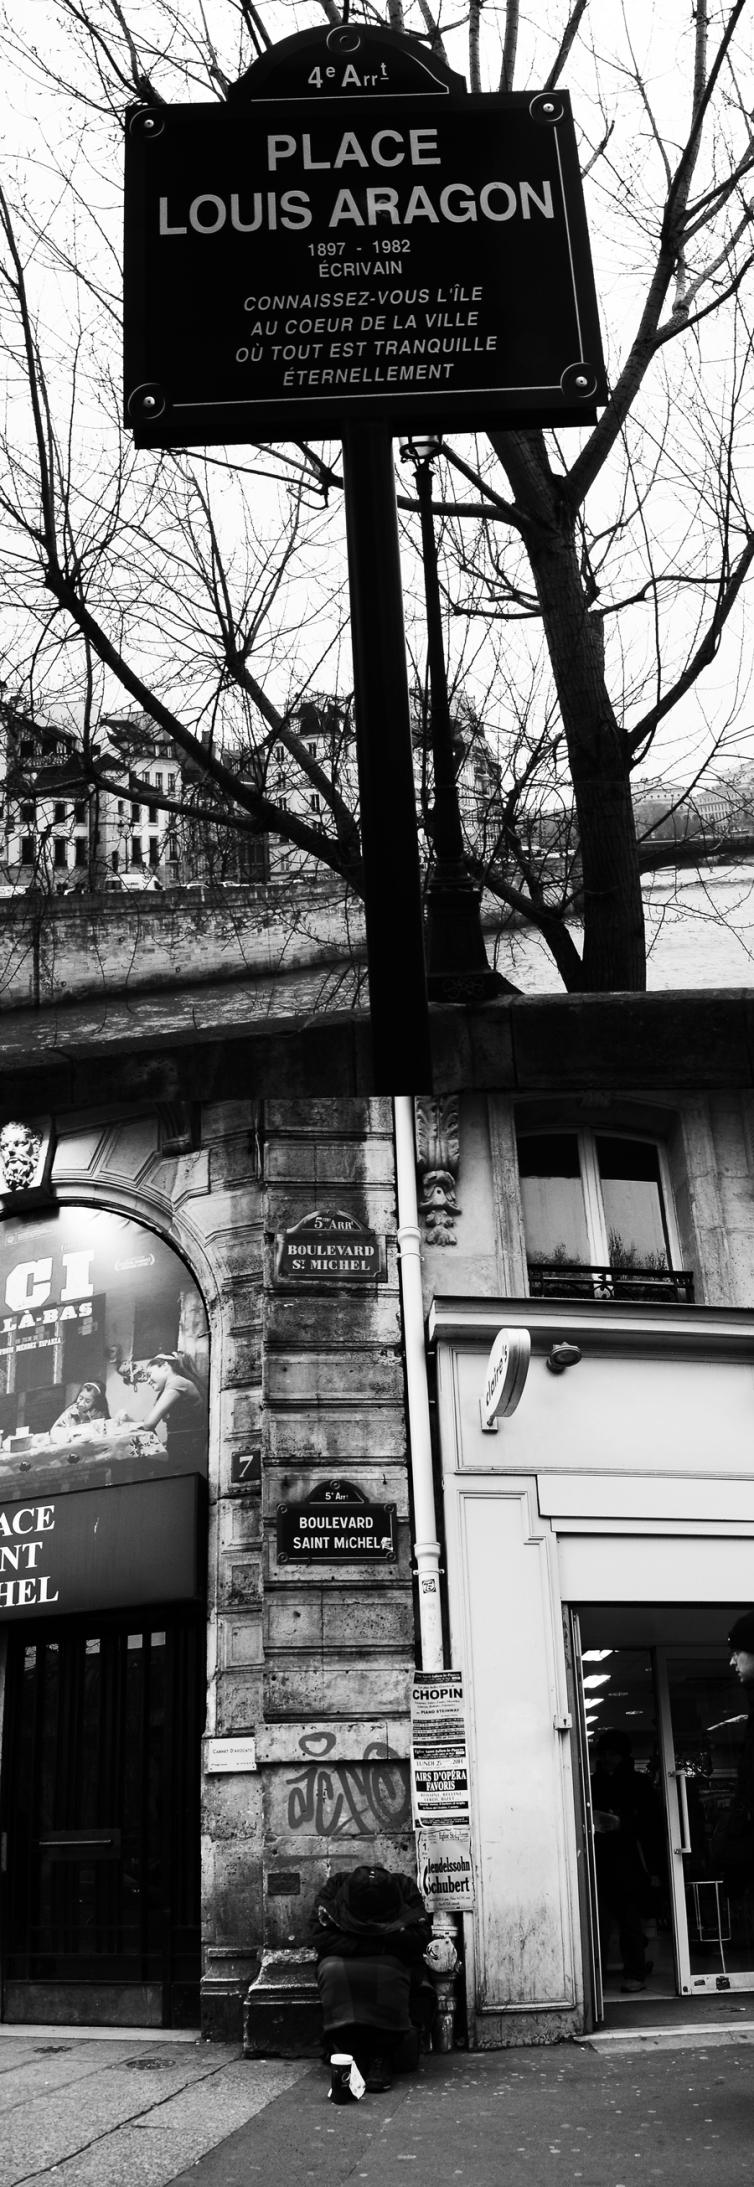 'Paris' by Nizar M. Halloun © Attribution Non-commercial Share Alike